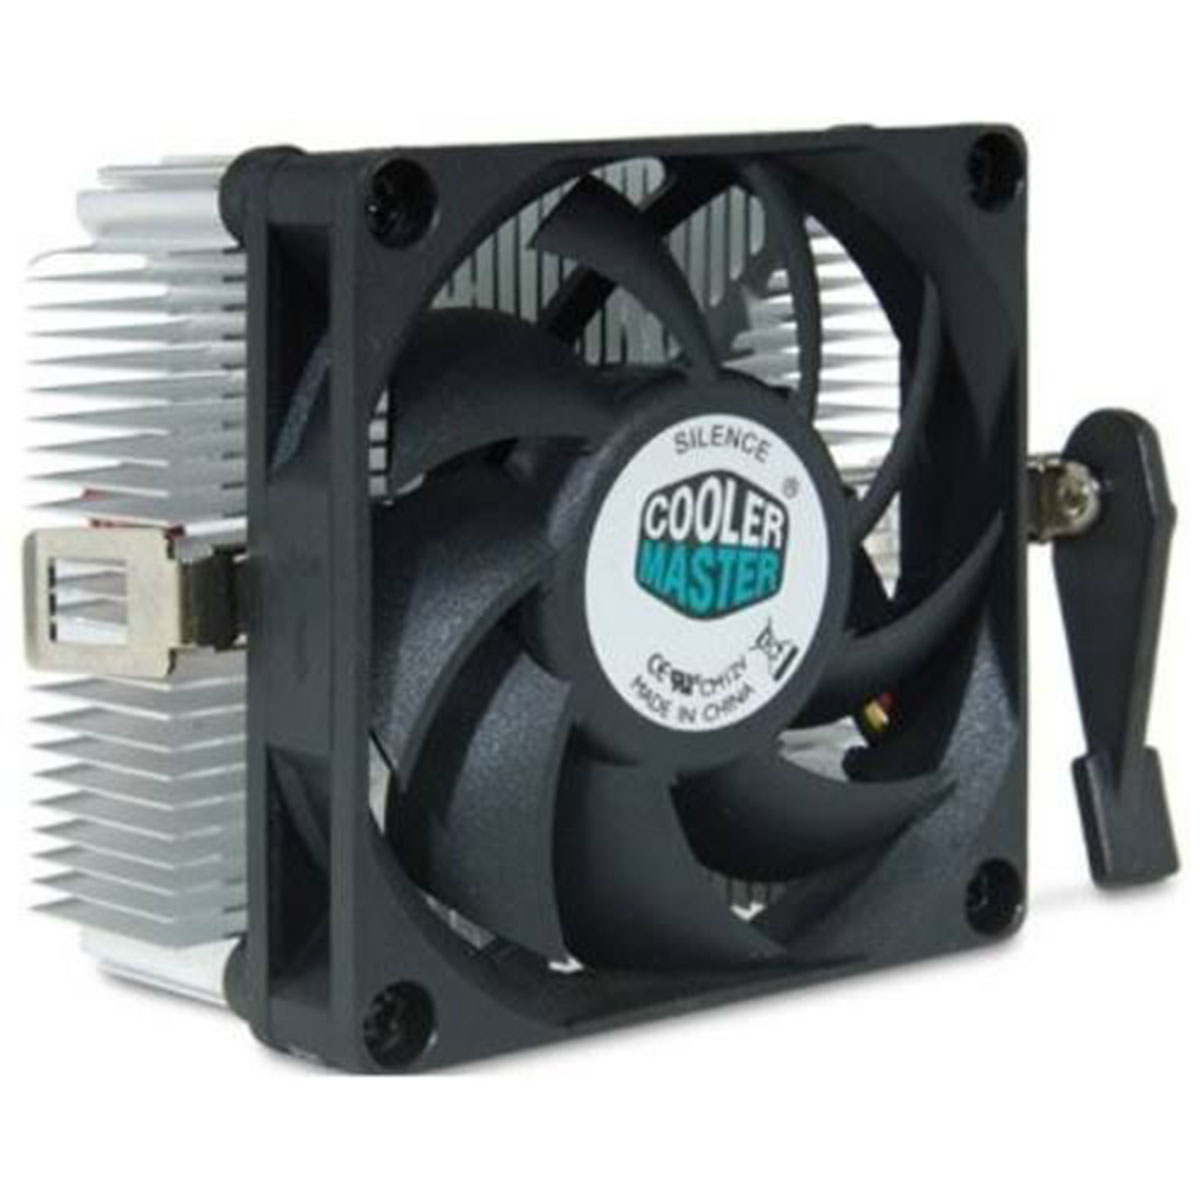 Cooler p/ Processador AMD AM2/AM3 Cooler Master A7015